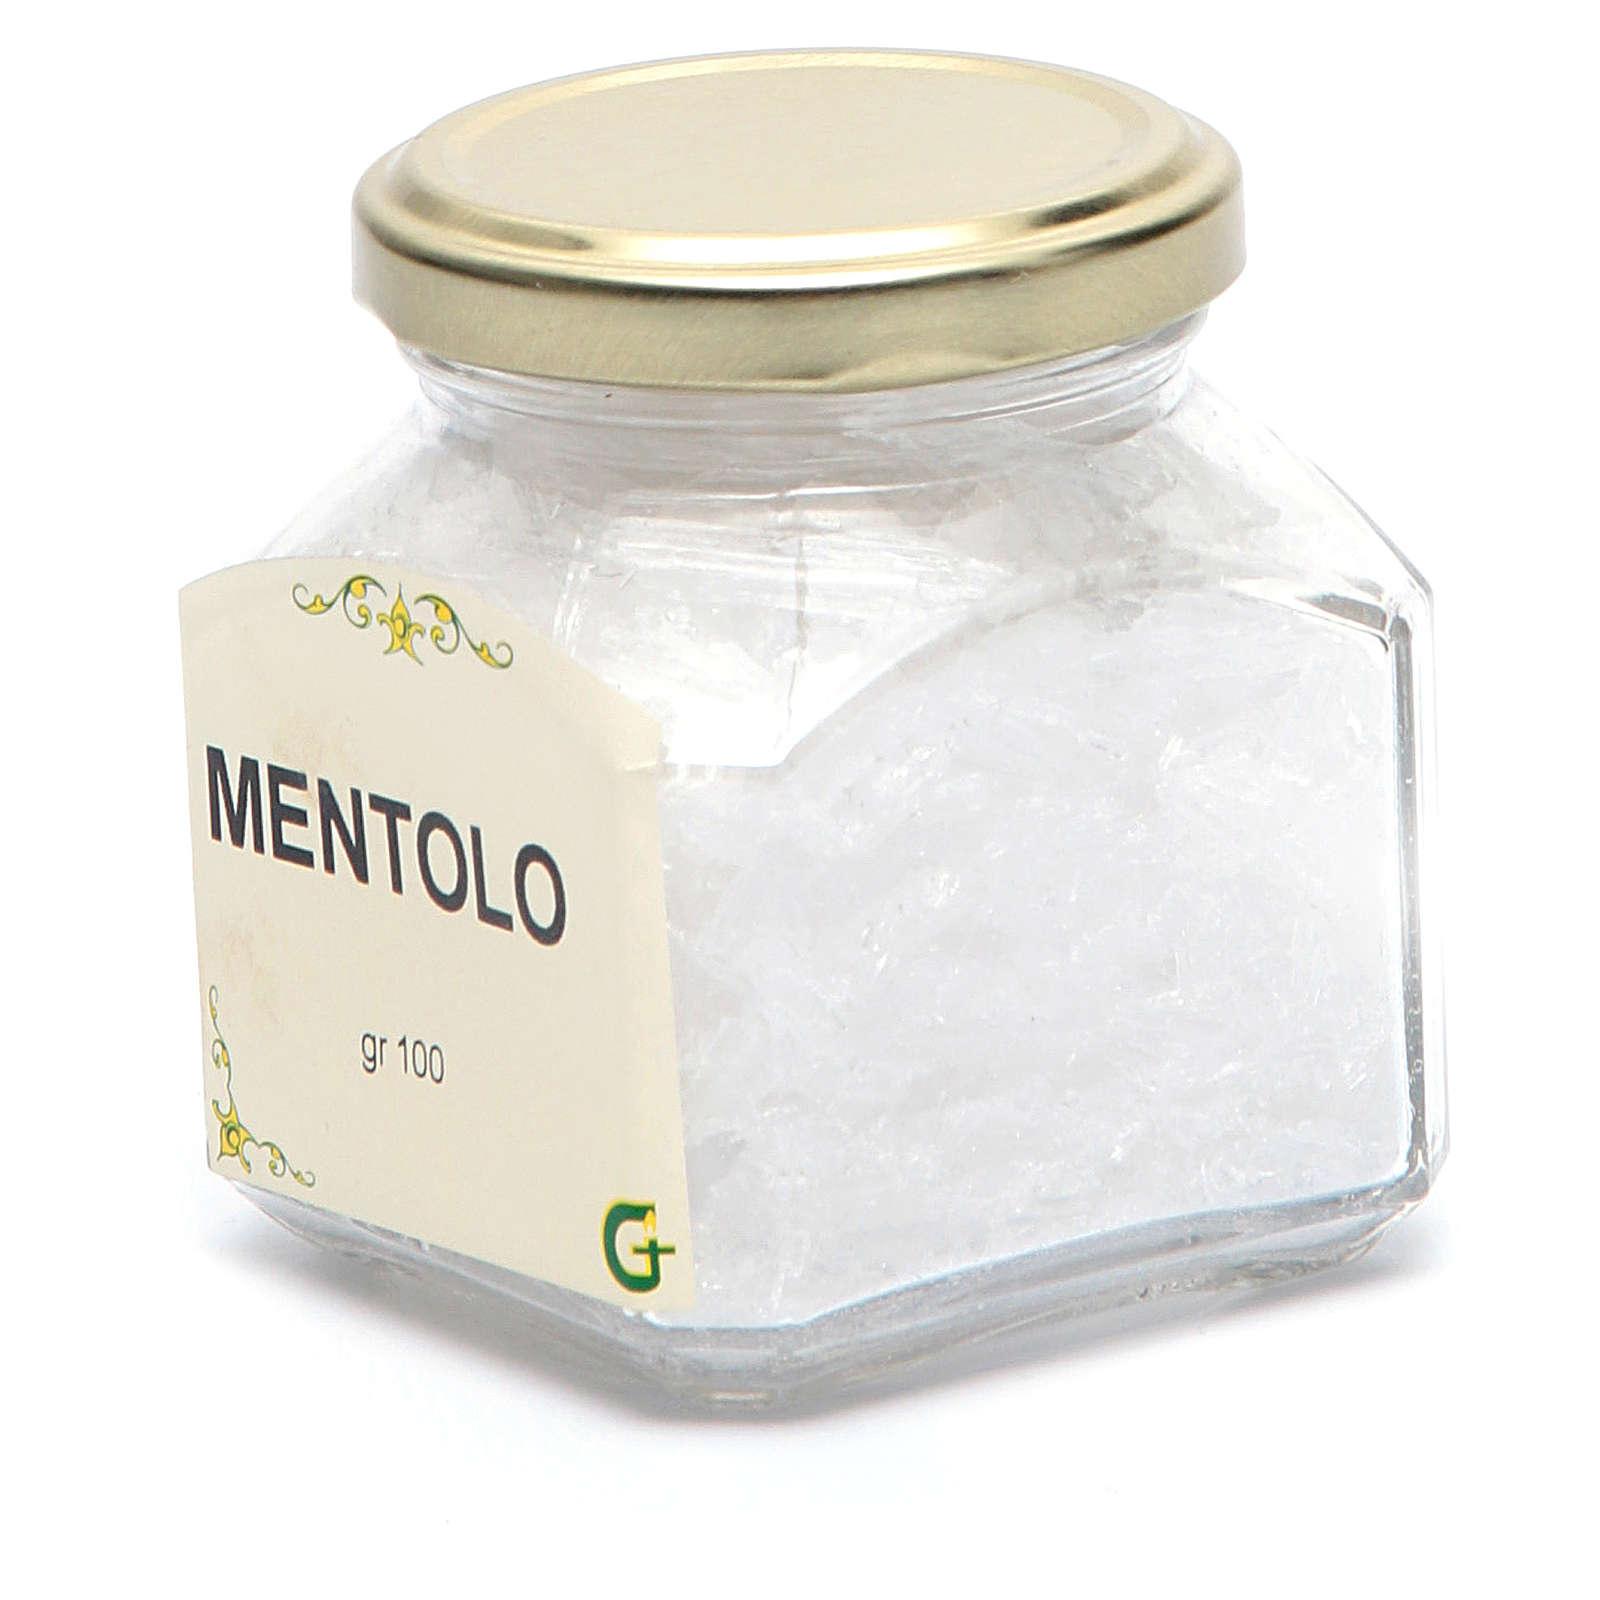 Menthol 3